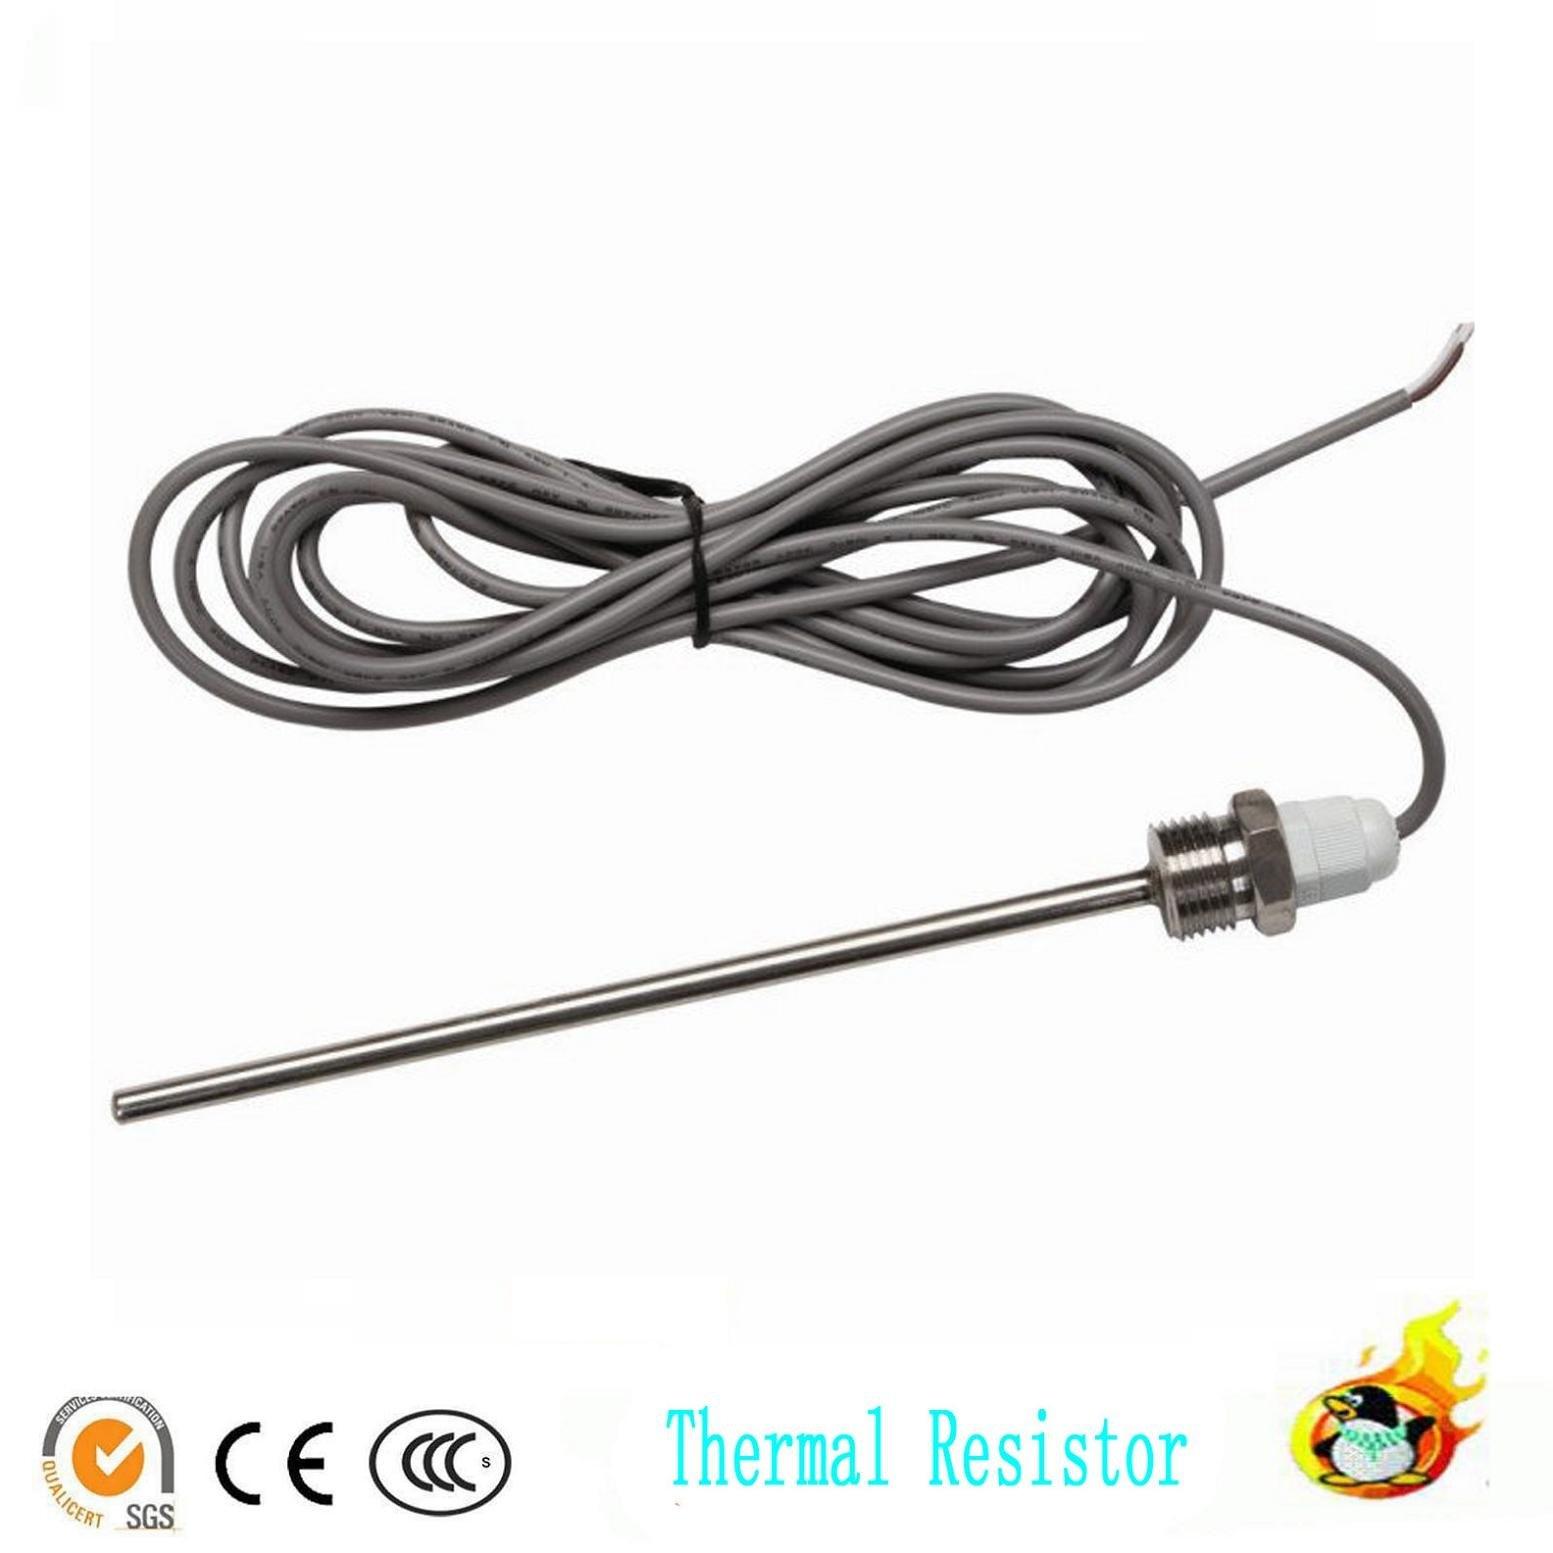 Resistance Thermometer Ntc 10k Sensor B Dia 6mm For